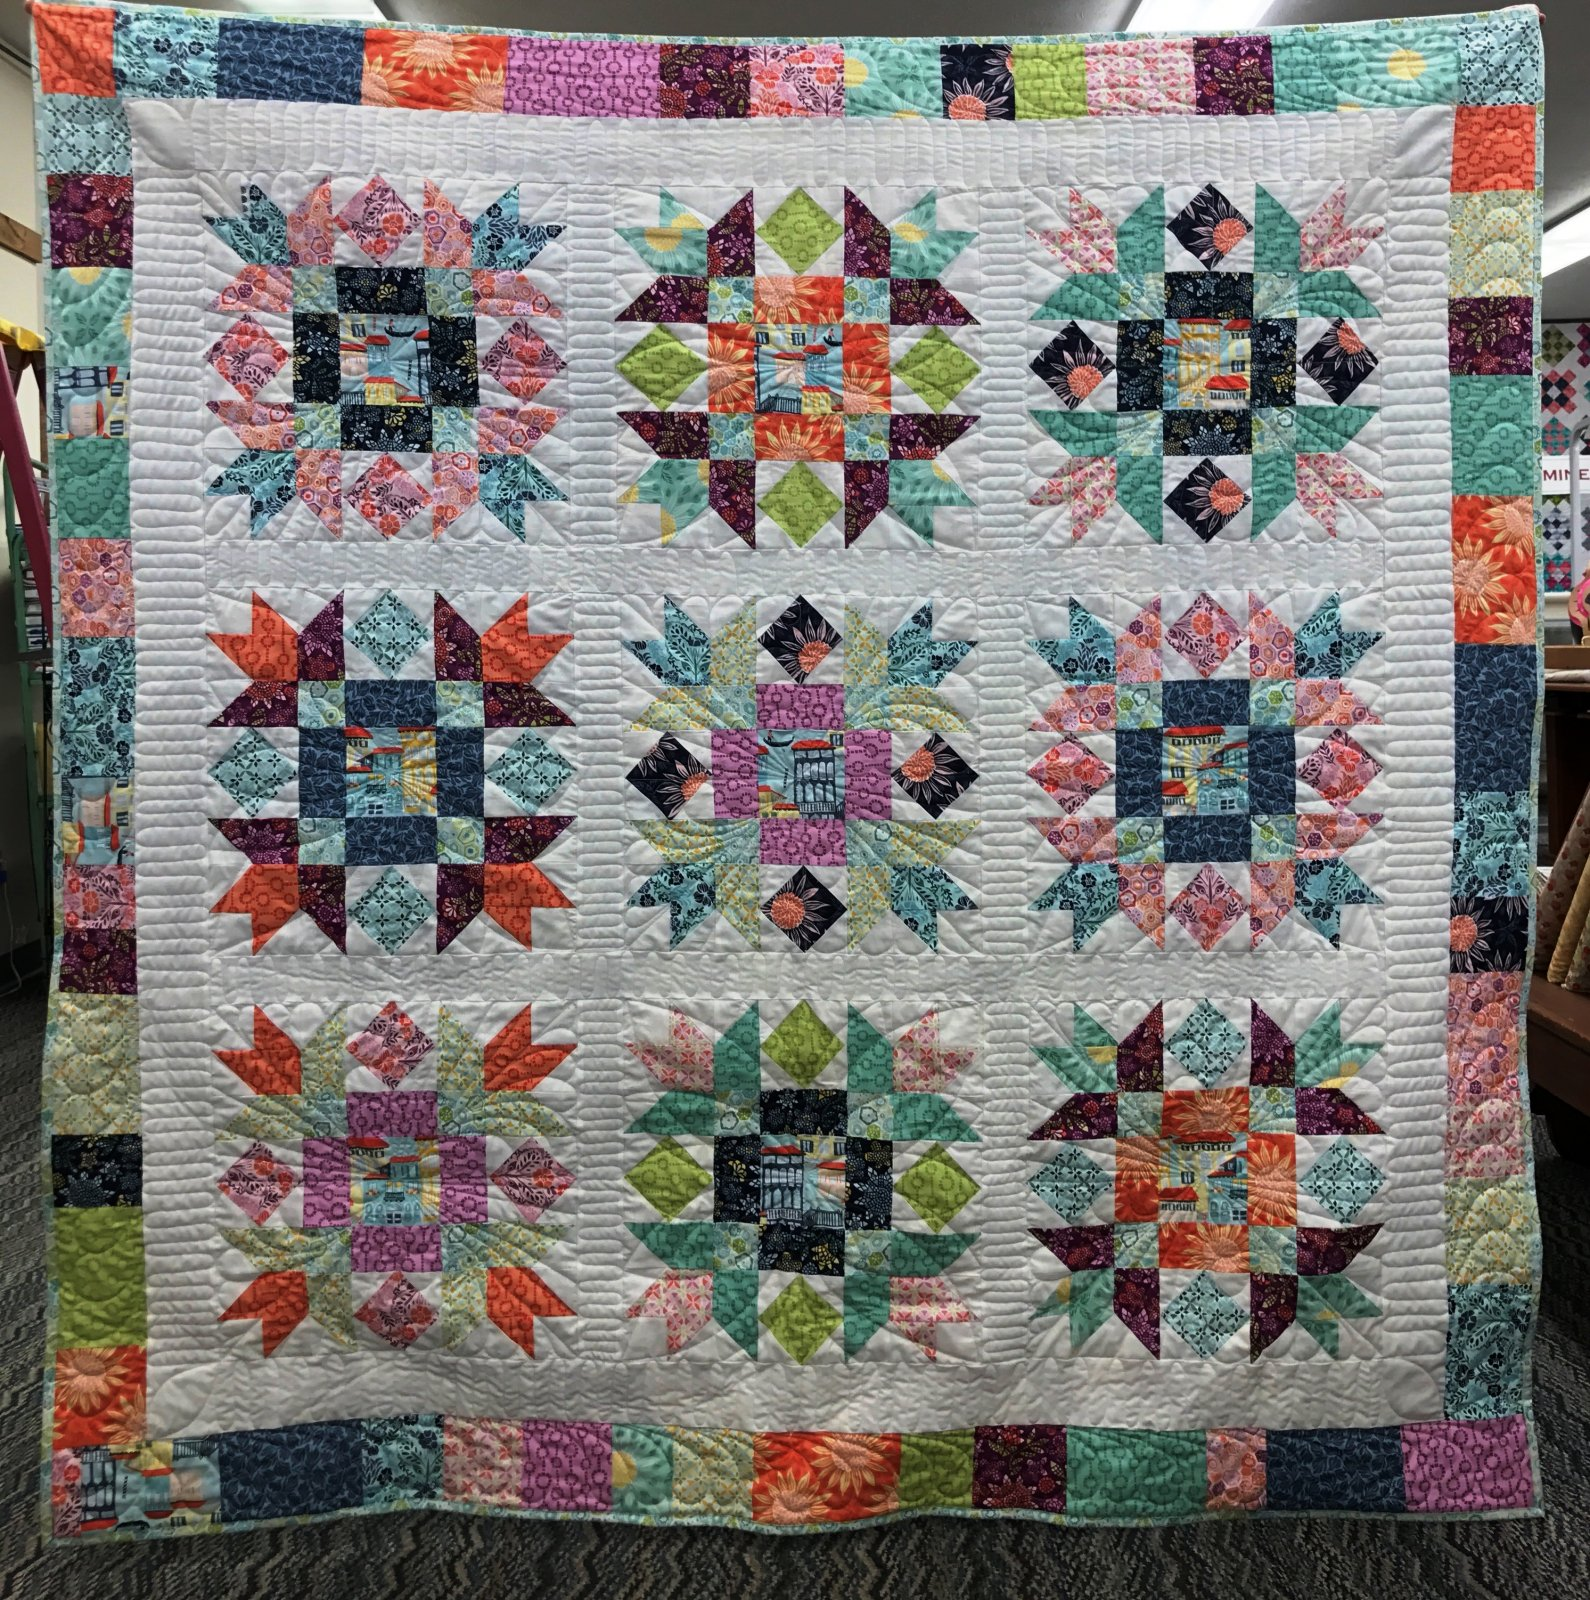 Sewing Garden Quilt Kit